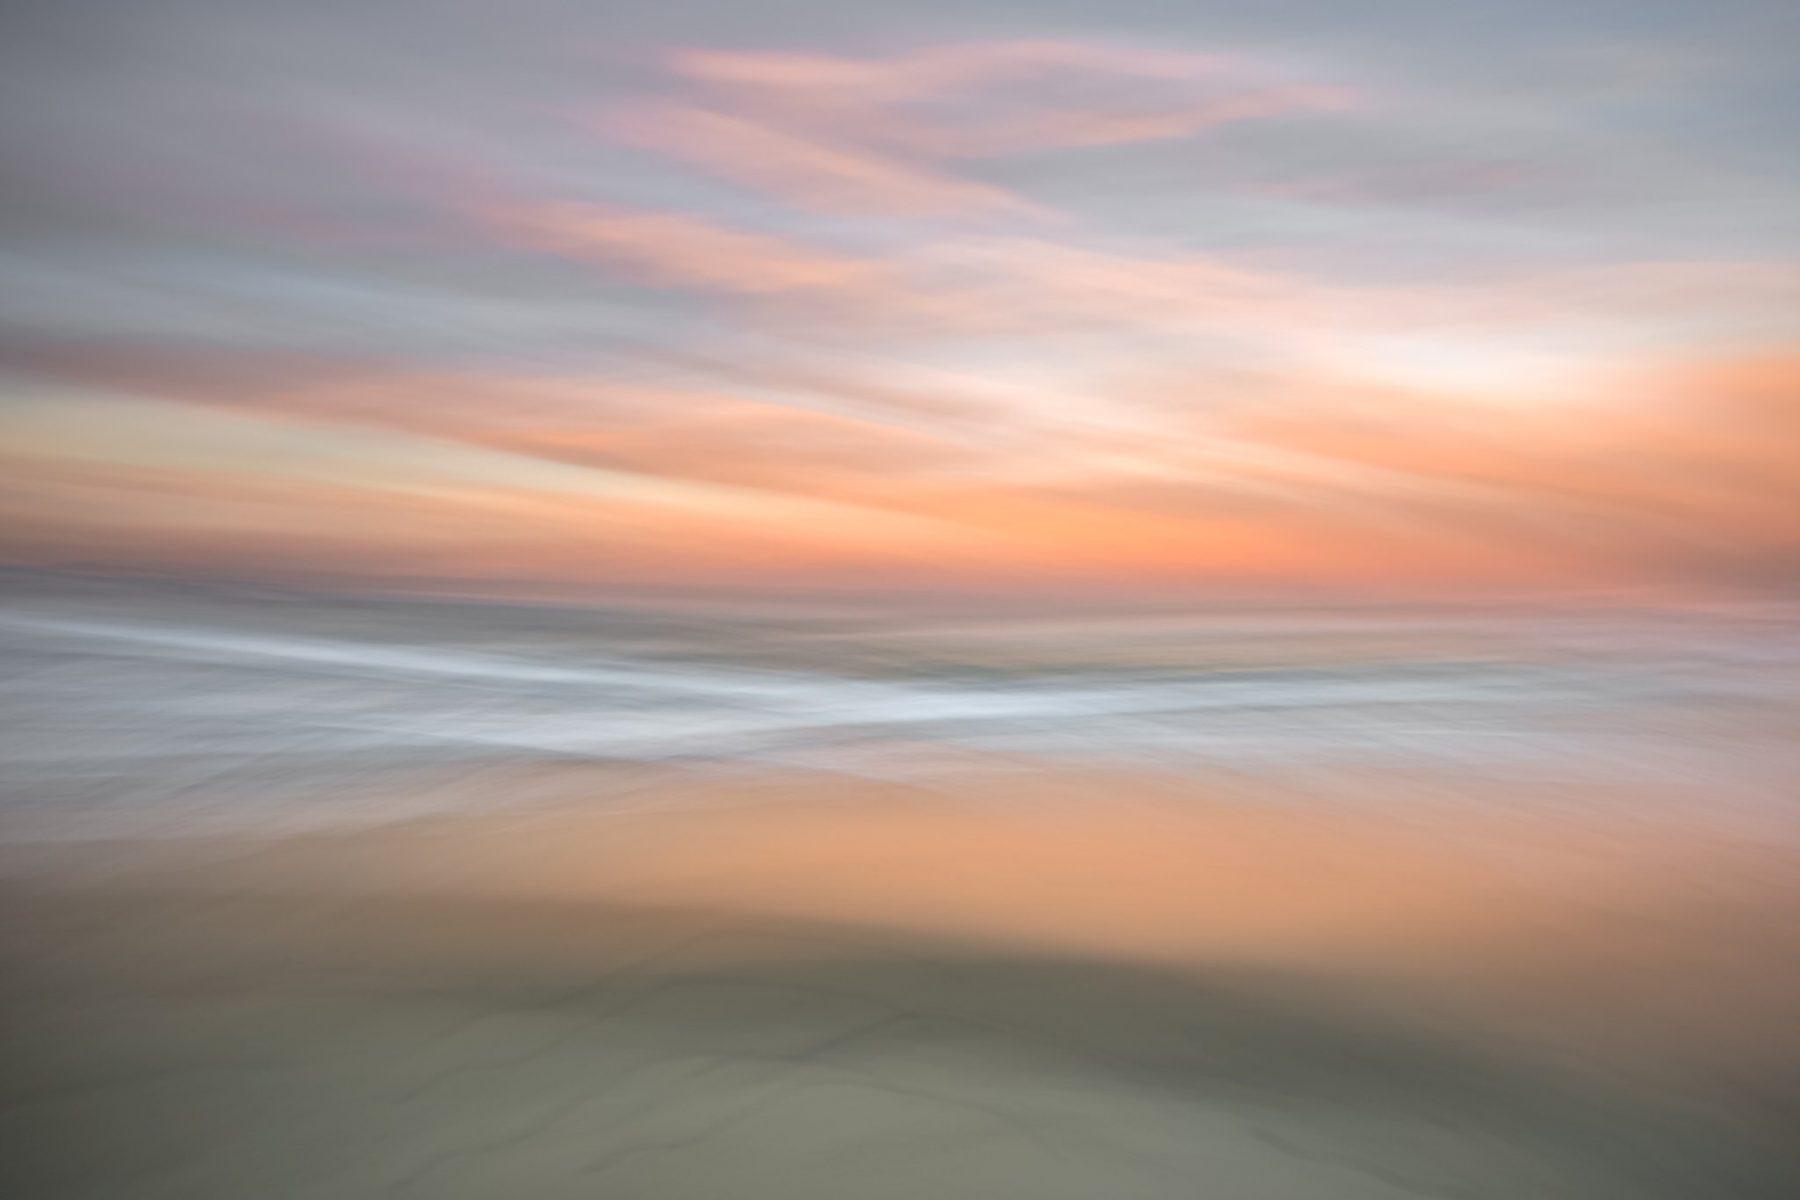 1st - Alexander S. Kunz - Morning Pastels in Motion